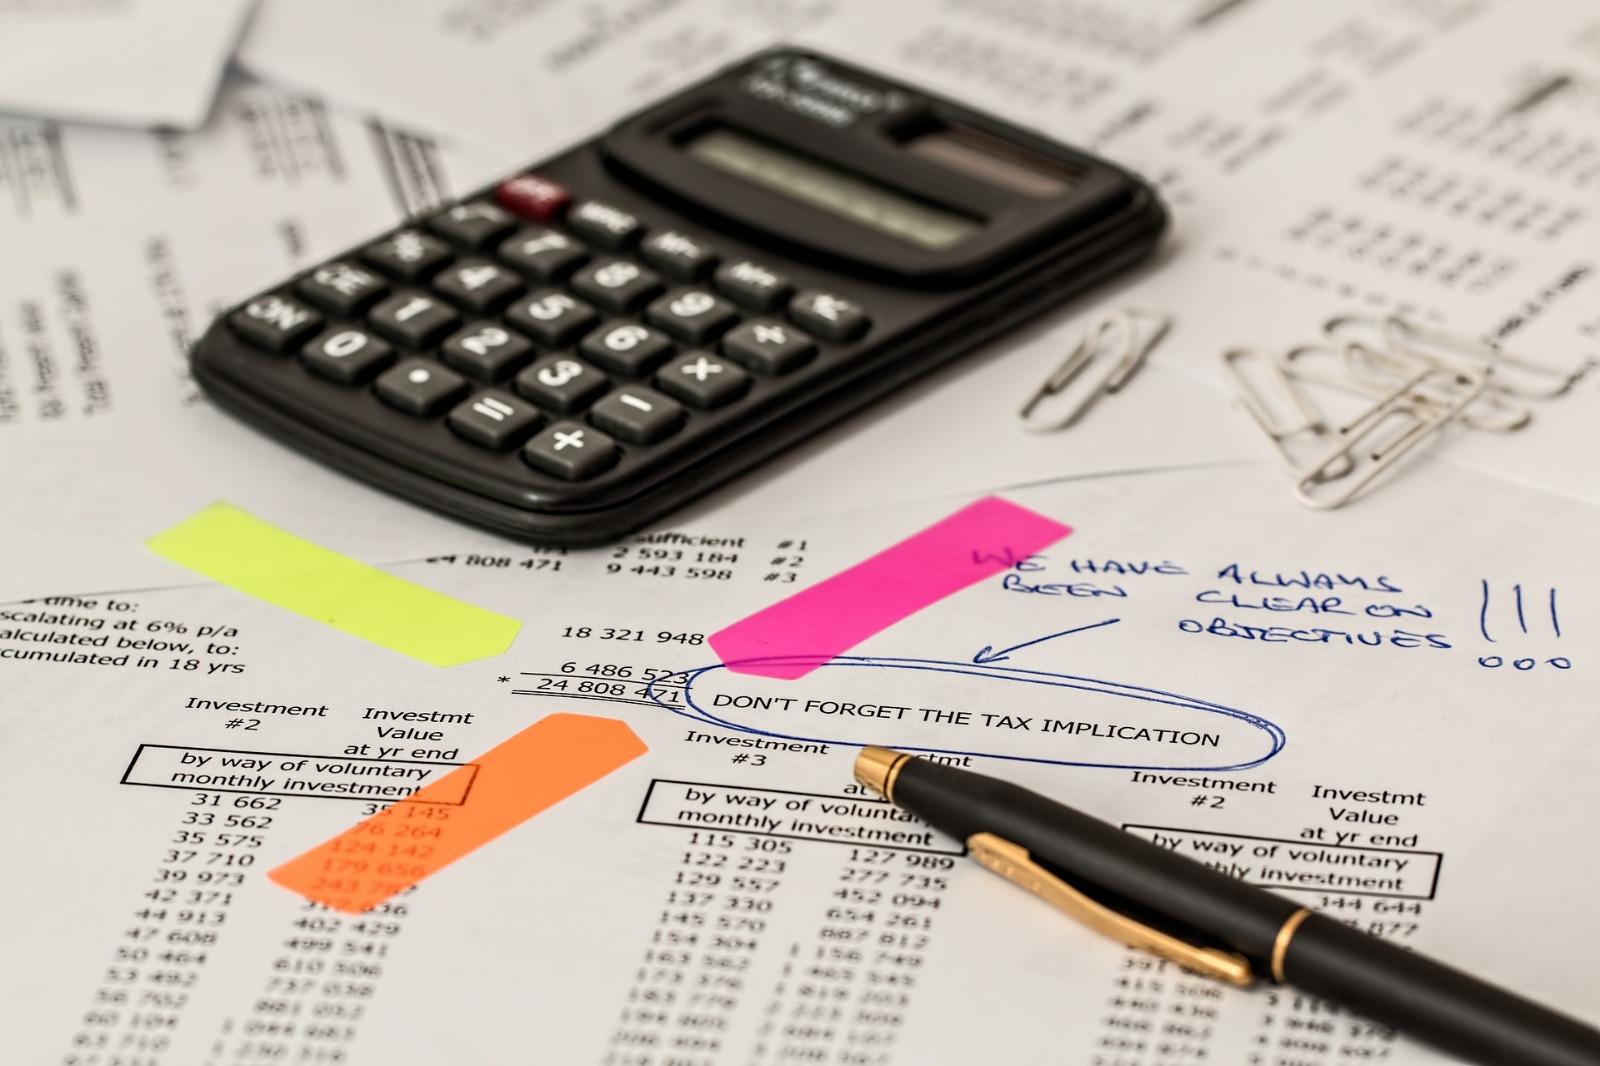 tassazione ordinaria o trasparente